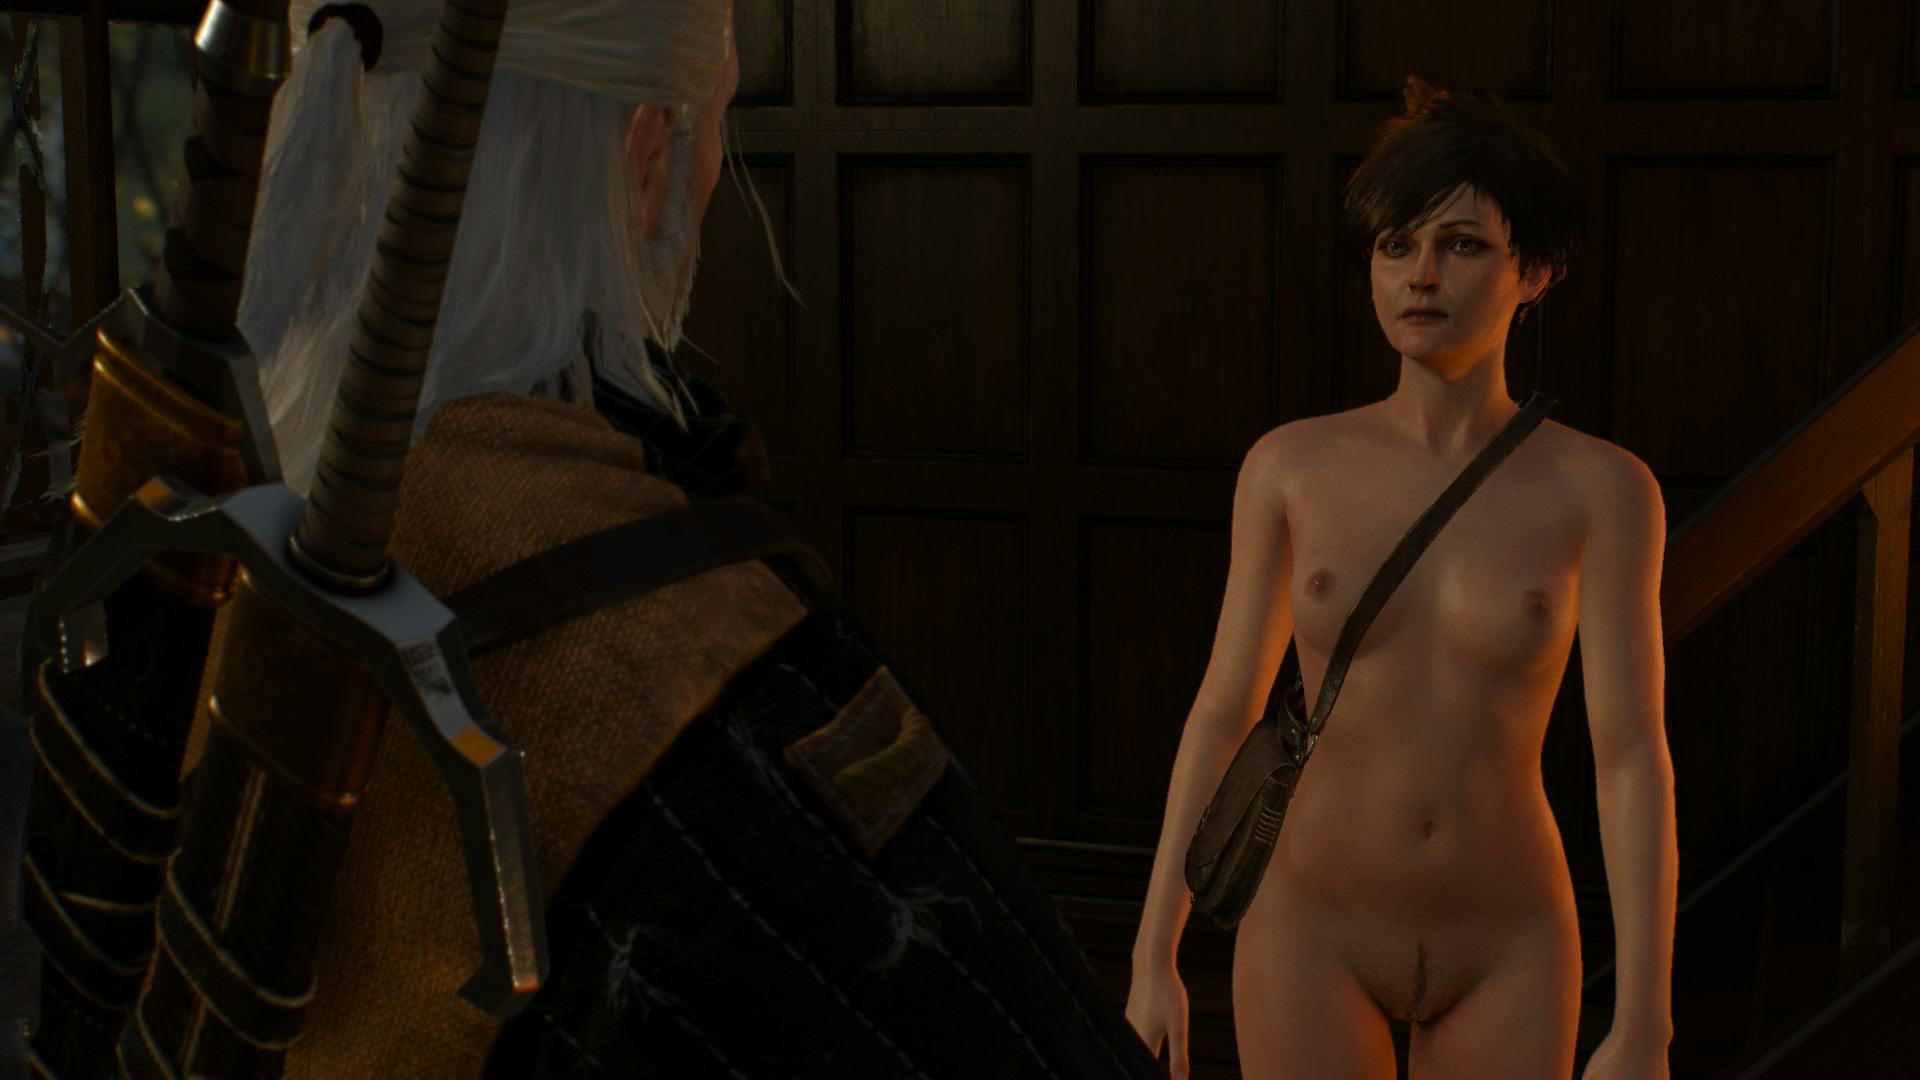 Borderlands Nude Mod Delightful the witcher 3: wild hunt | nude-патчи для игр